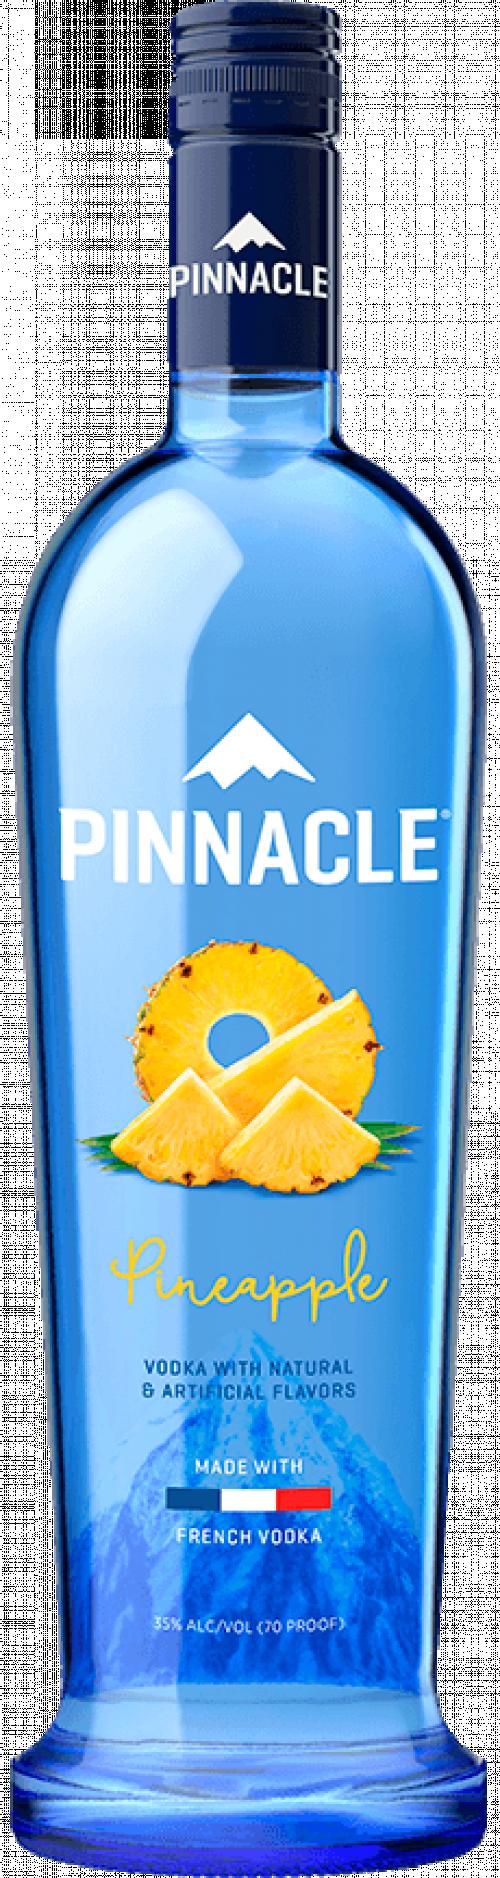 Pinnacle Pineapple Vodka 1.75L